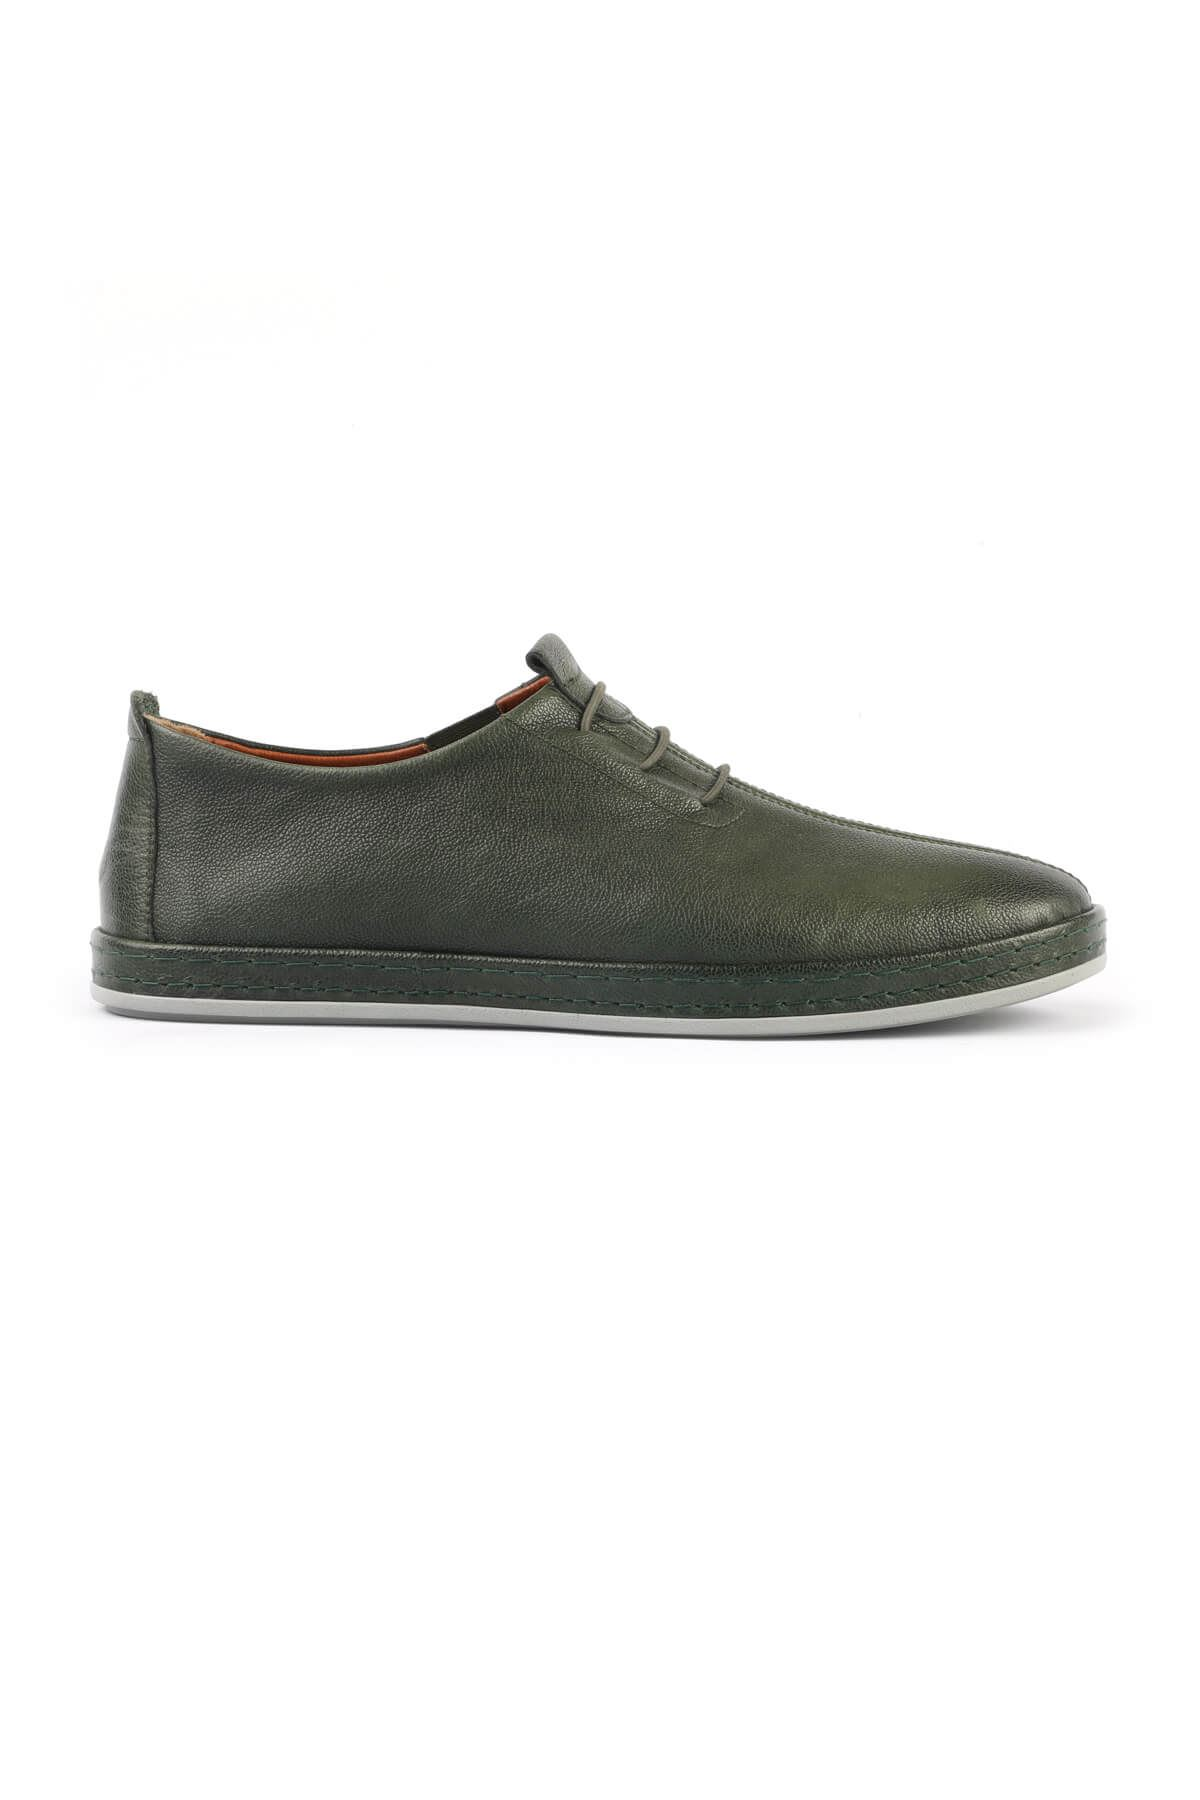 Libero 3042 Green Casual Shoes